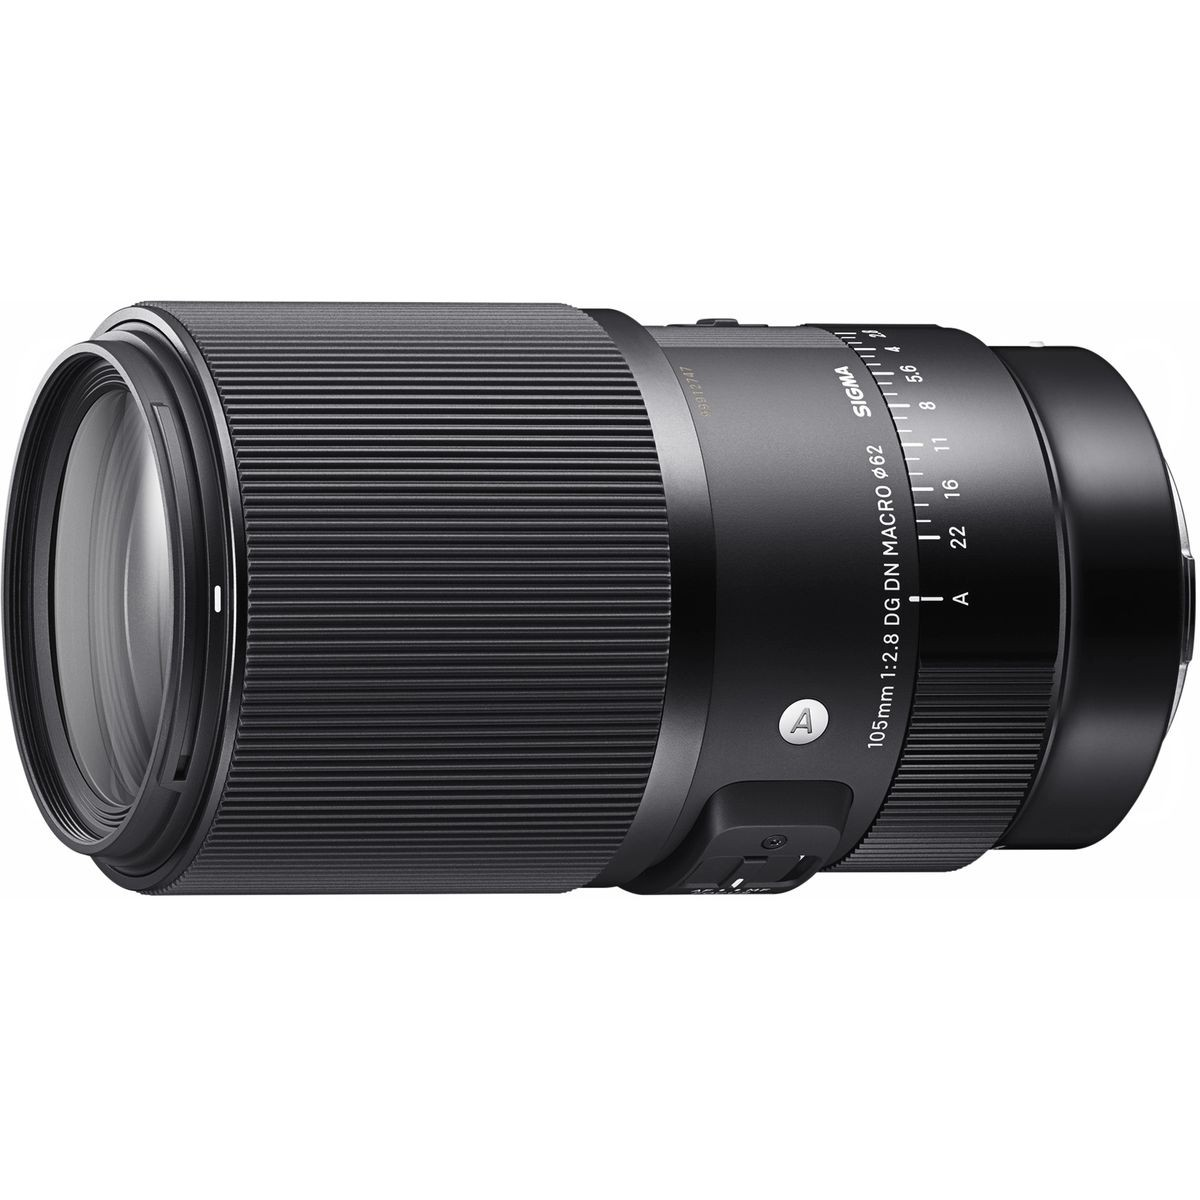 Sigma 105mm F2.8 DG DN Macro Art E-mount